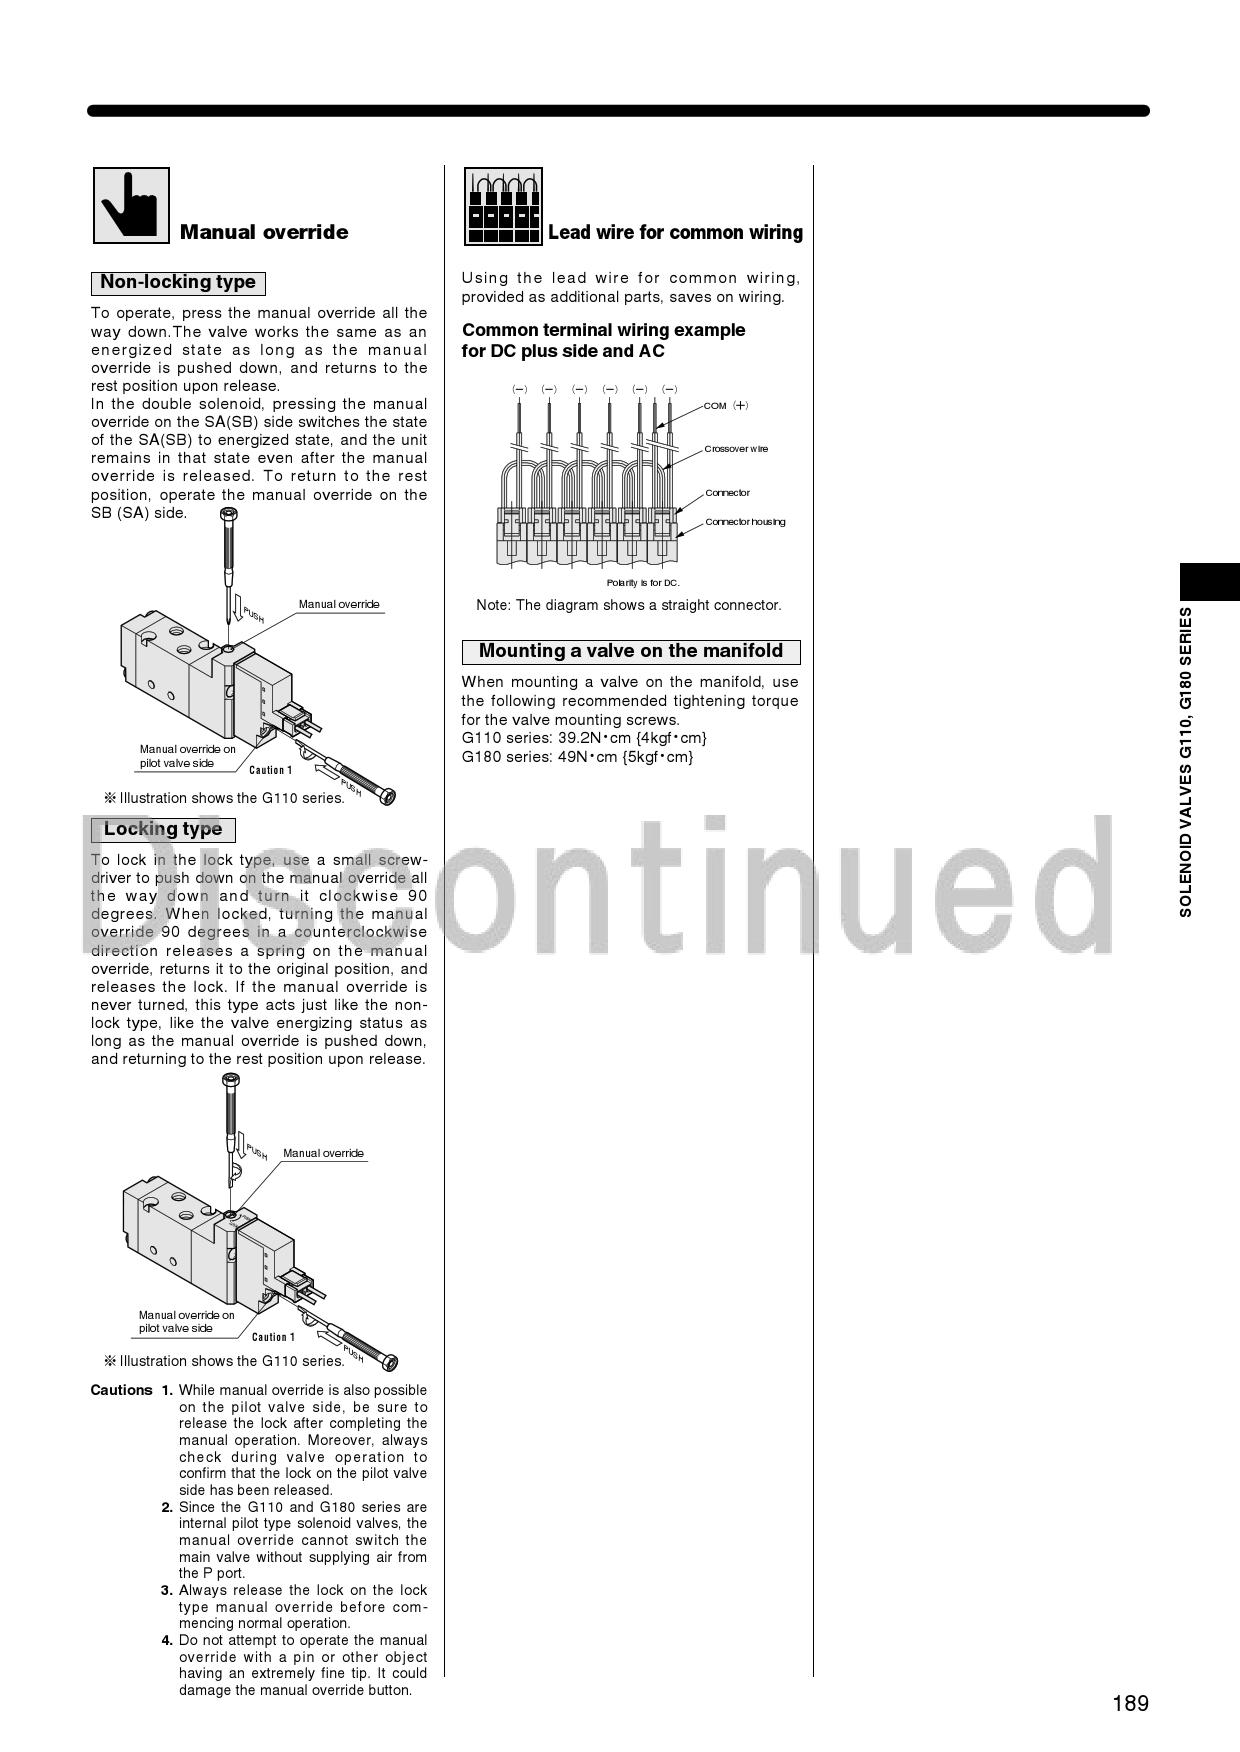 2004 Isuzu Ascender Fuse Box Diagram on Buick Rainier Wiring Diagram